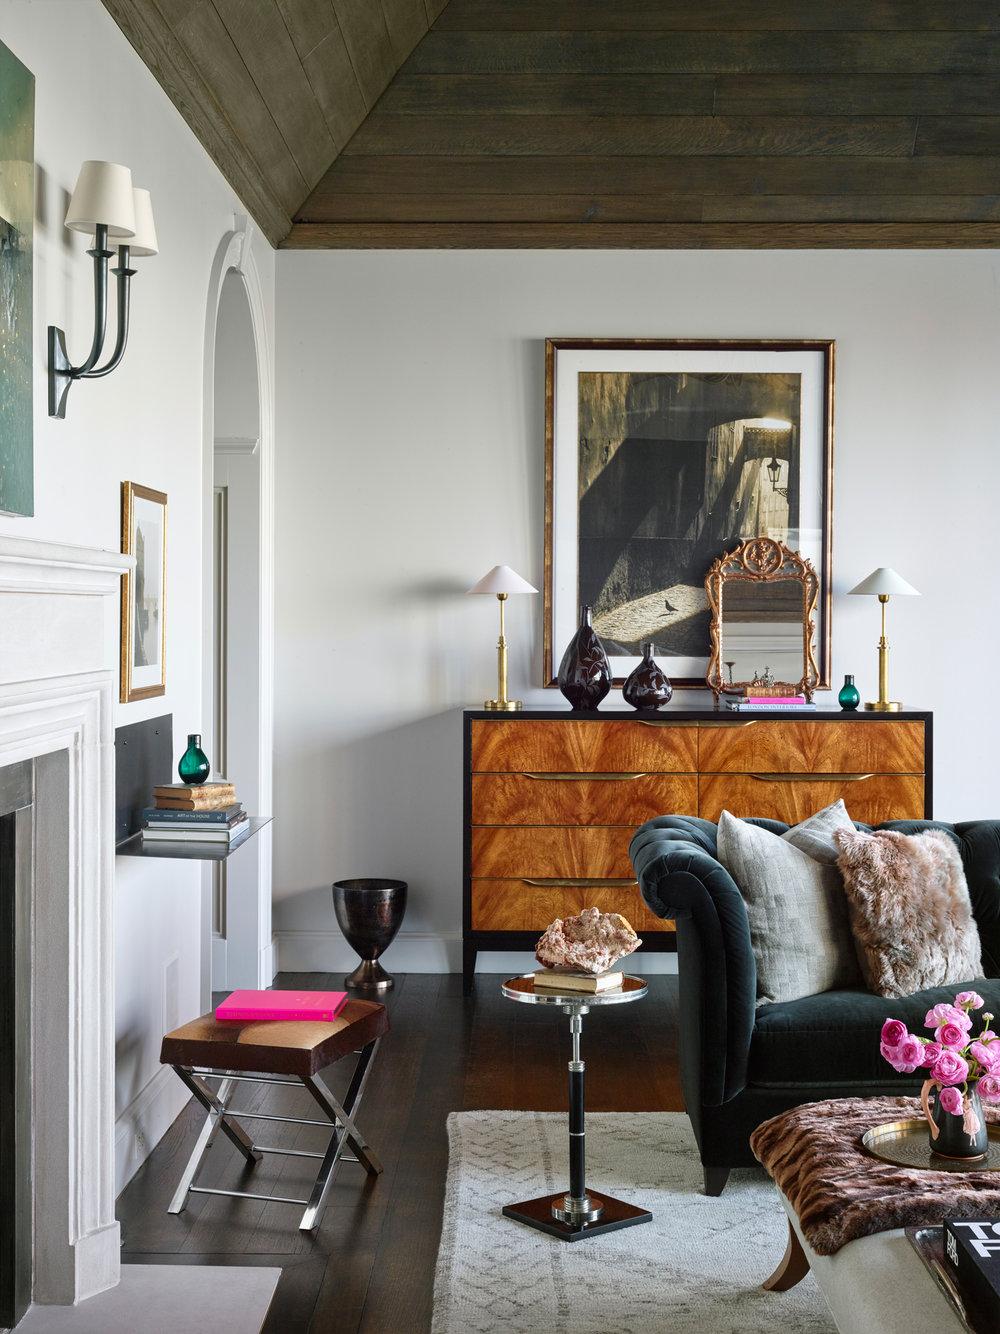 Beth McMillian Interiors